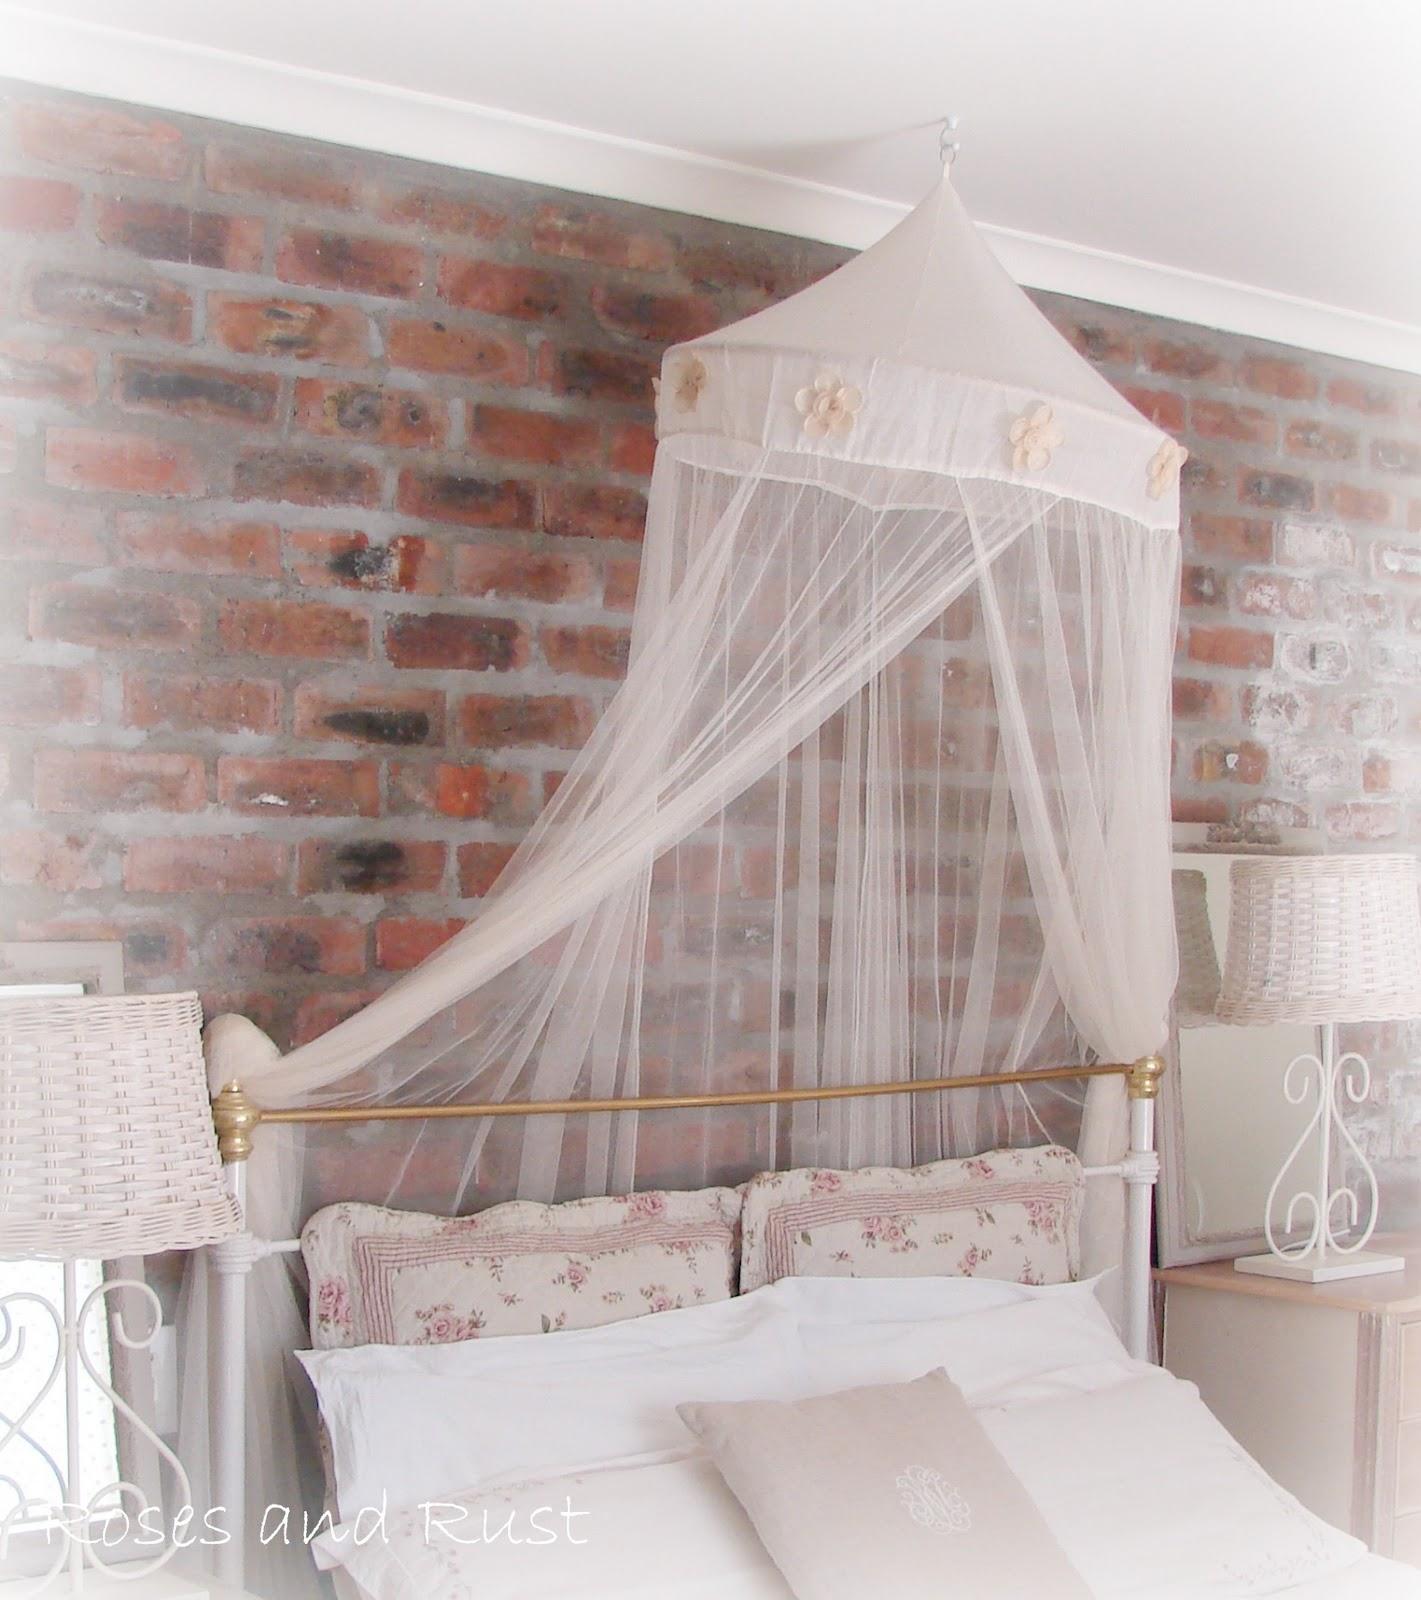 Bedroom Sets For Girls White Brick Wallpaper Bedroom Rectangular Bedroom Design Ideas Kids Bedroom Cupboard Designs: Pic New Posts: How To Wallpaper A Brick Wall